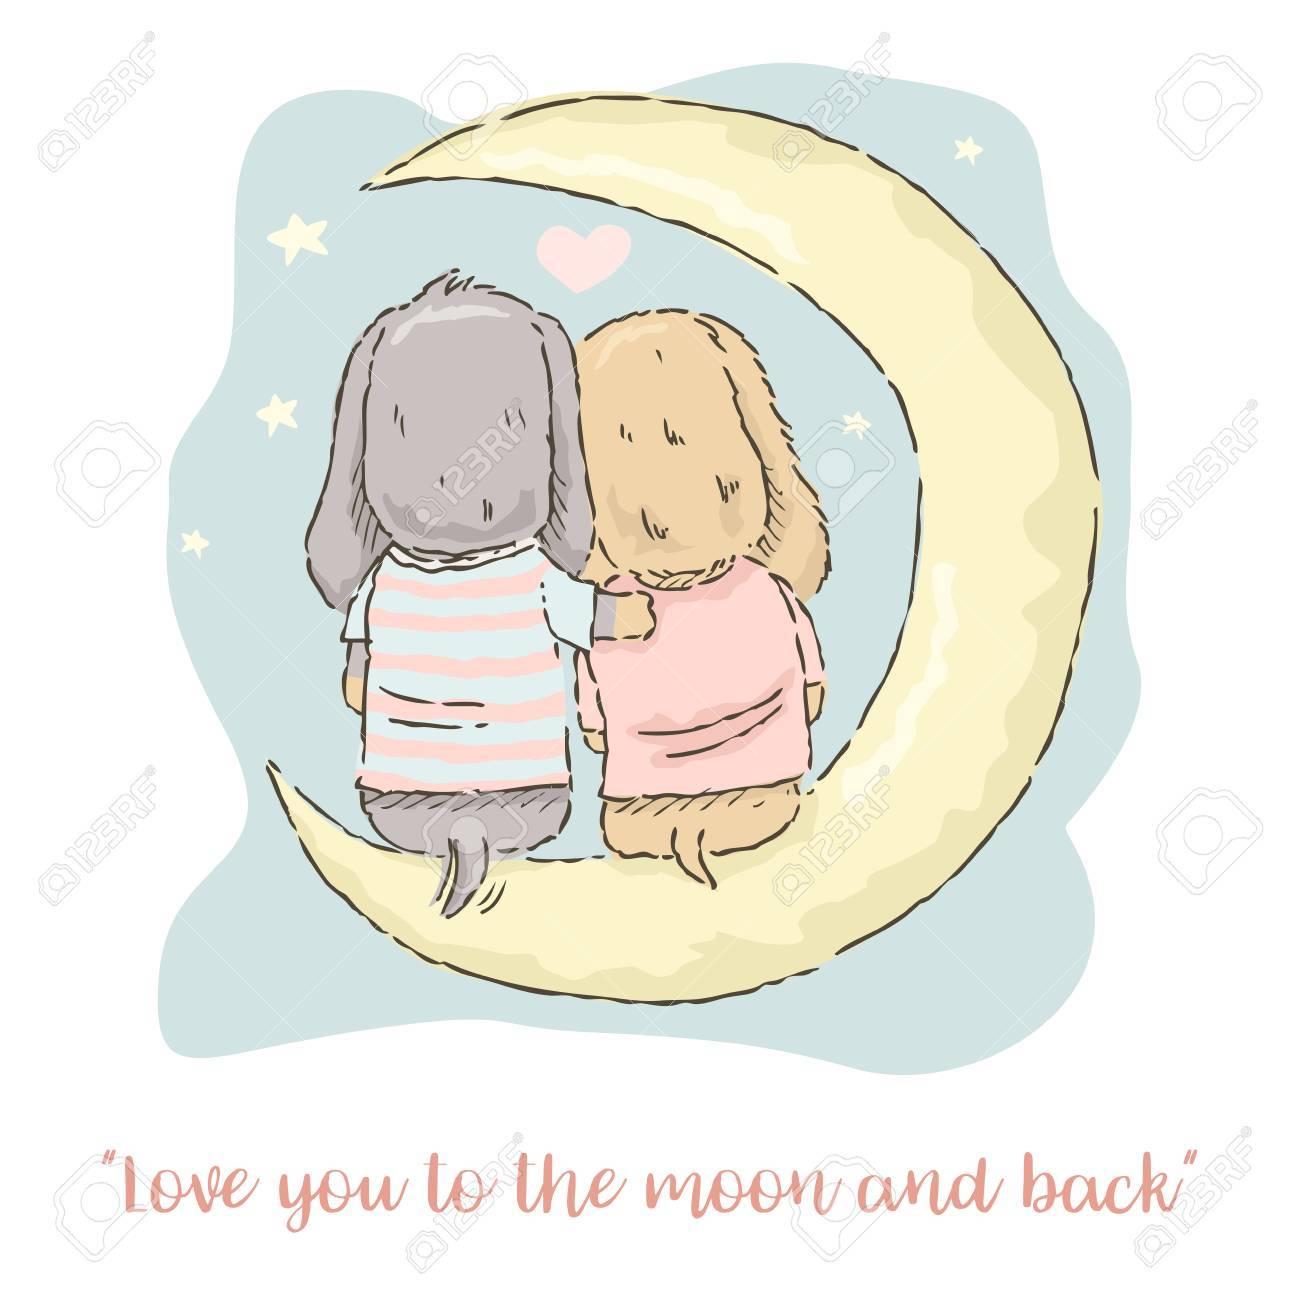 Carte De Saint Valentin Dessin Anime Mignon Couple De Teckel Assis